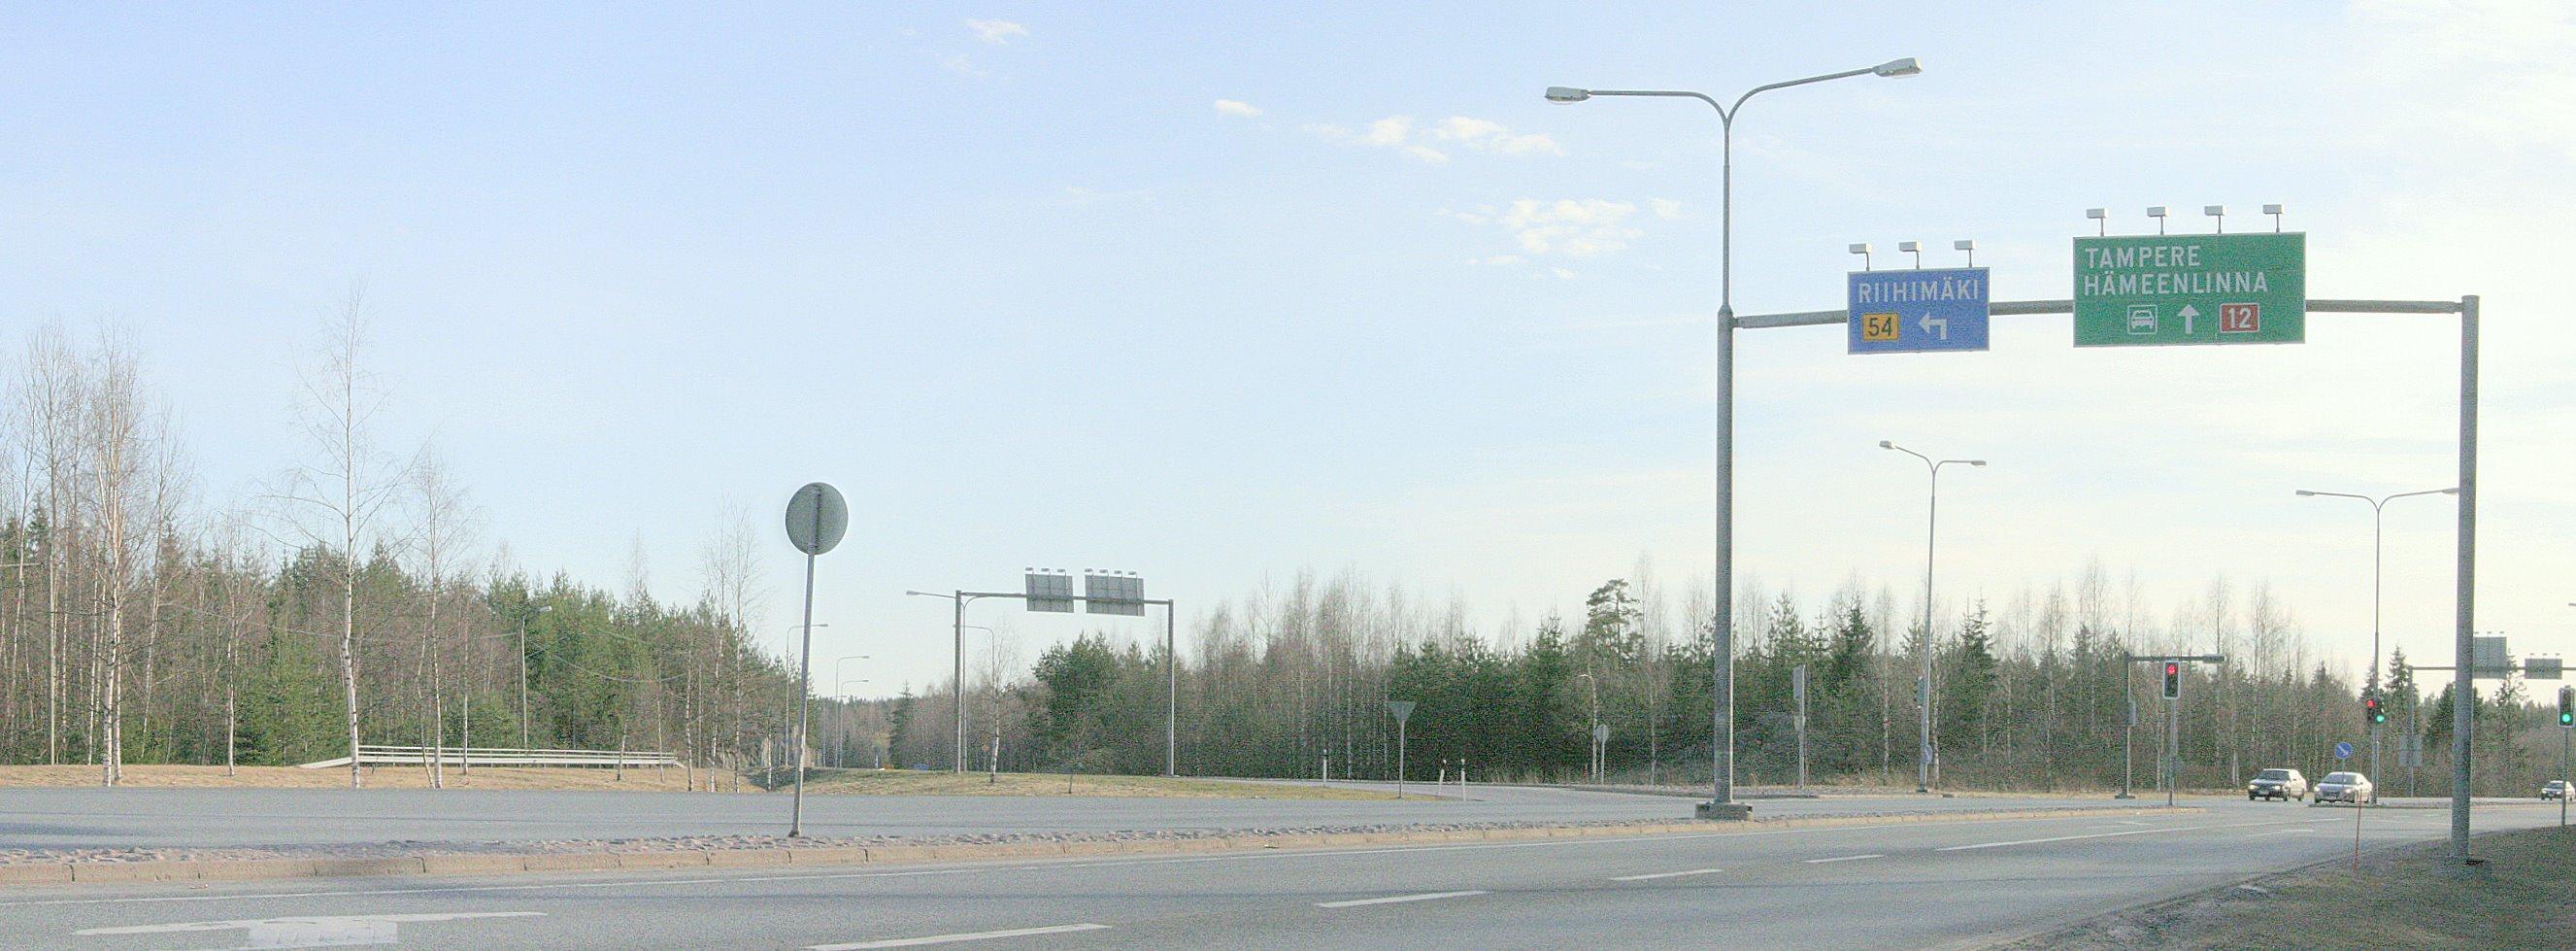 File:Road 54 main road 2nd class Okm Finland.jpg - Wikimedia Commons